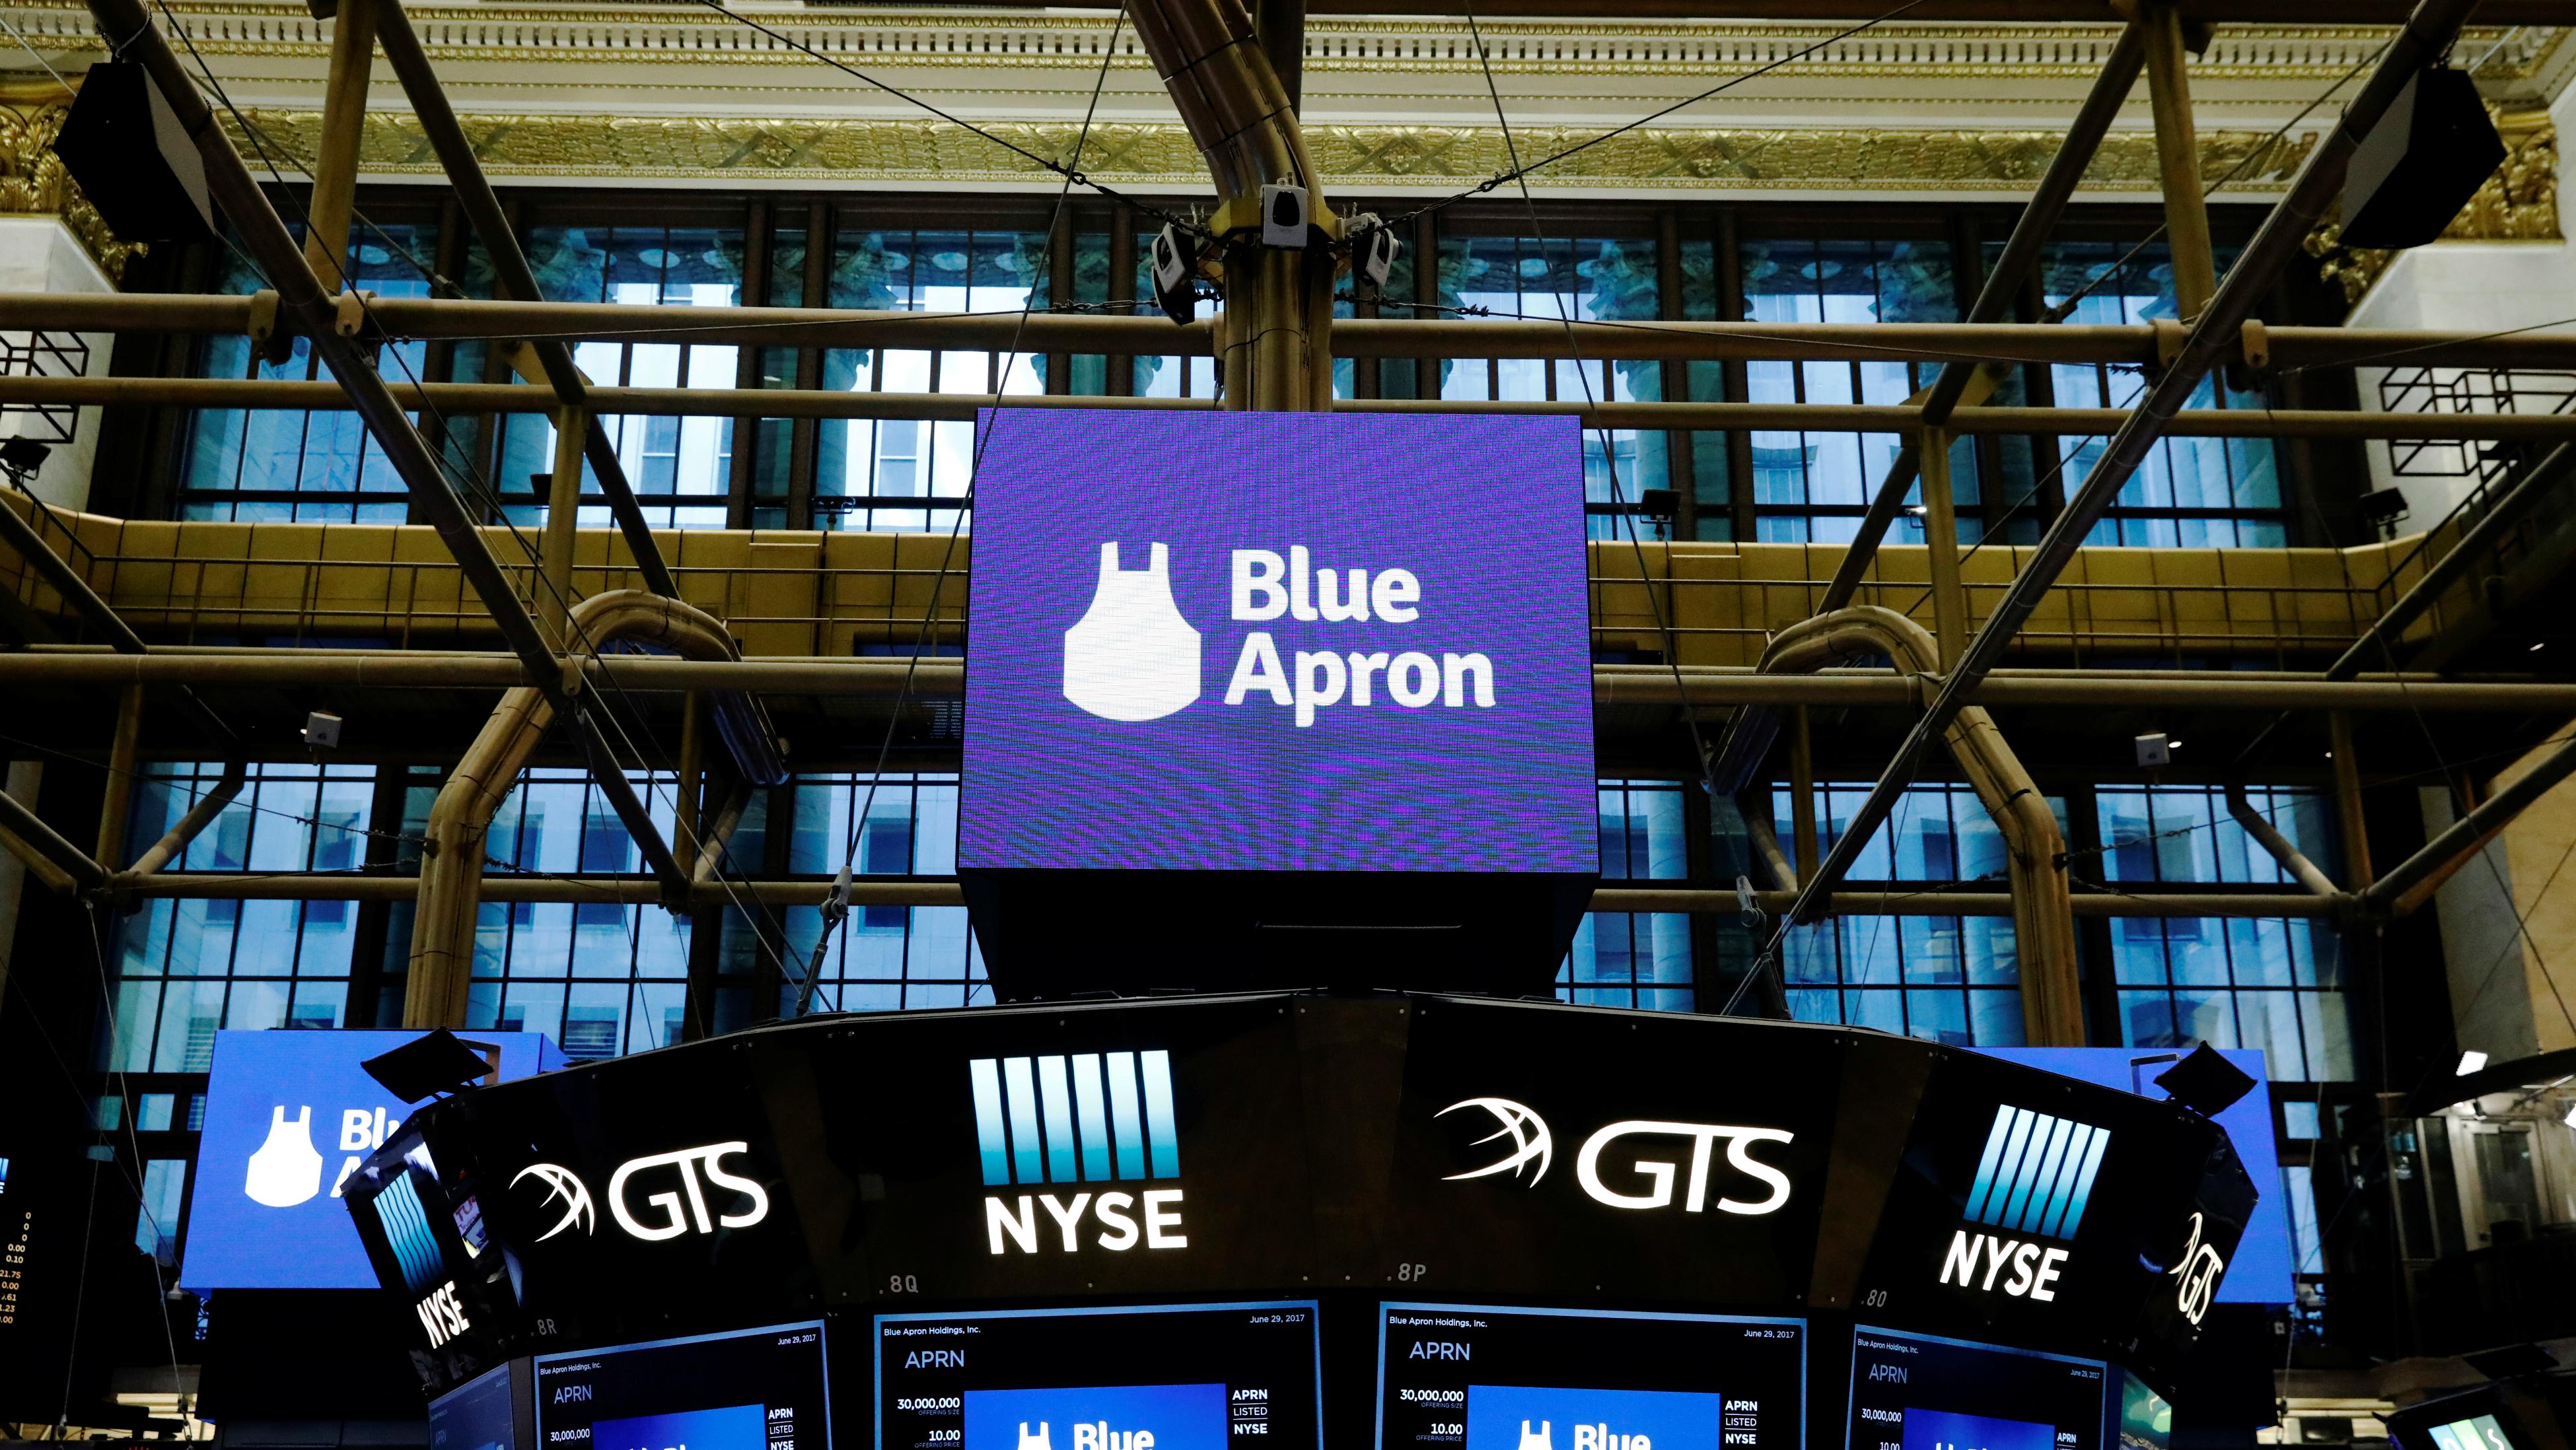 Blue Apron's wet blanket.